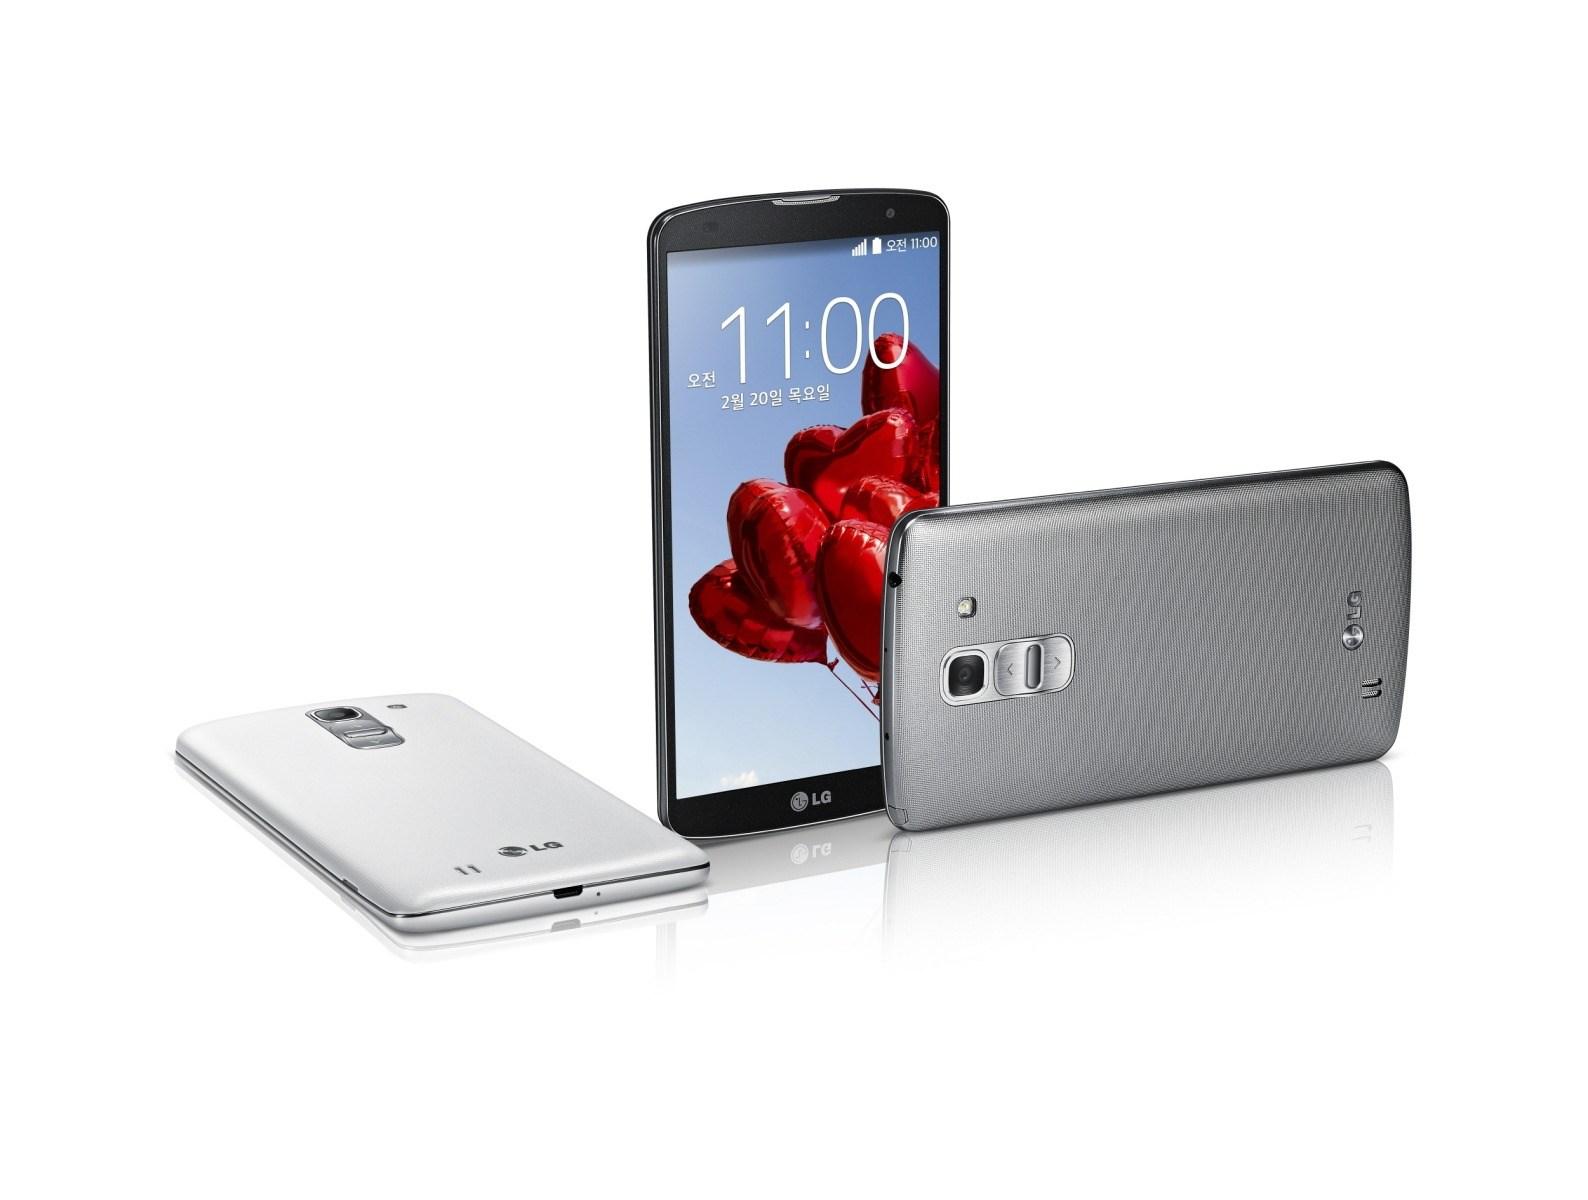 kurz gemeldet: LG G Pro 2: Smartphone-Flaggschiff mit Ultra-HD-Videos